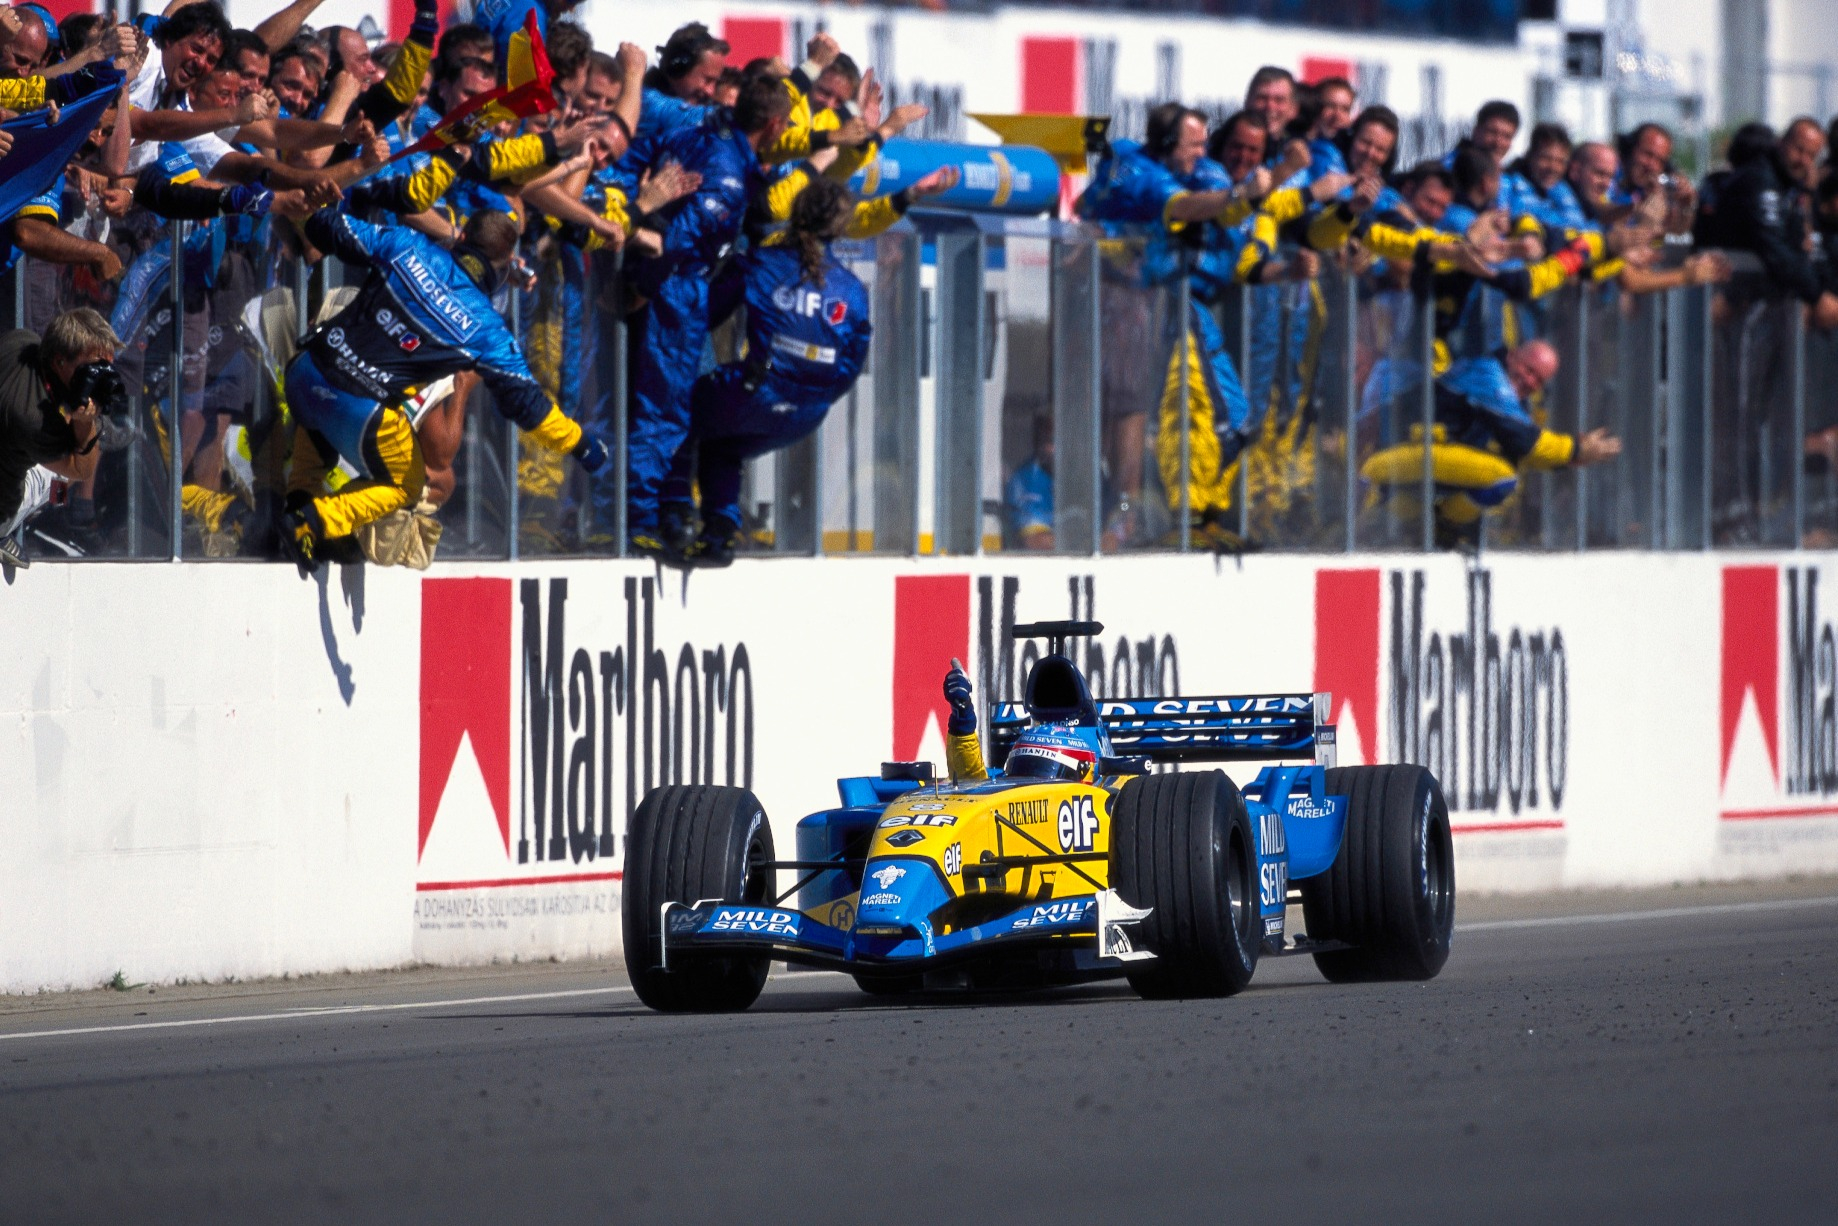 Fernando Alonso, 2003 Hungarian GP